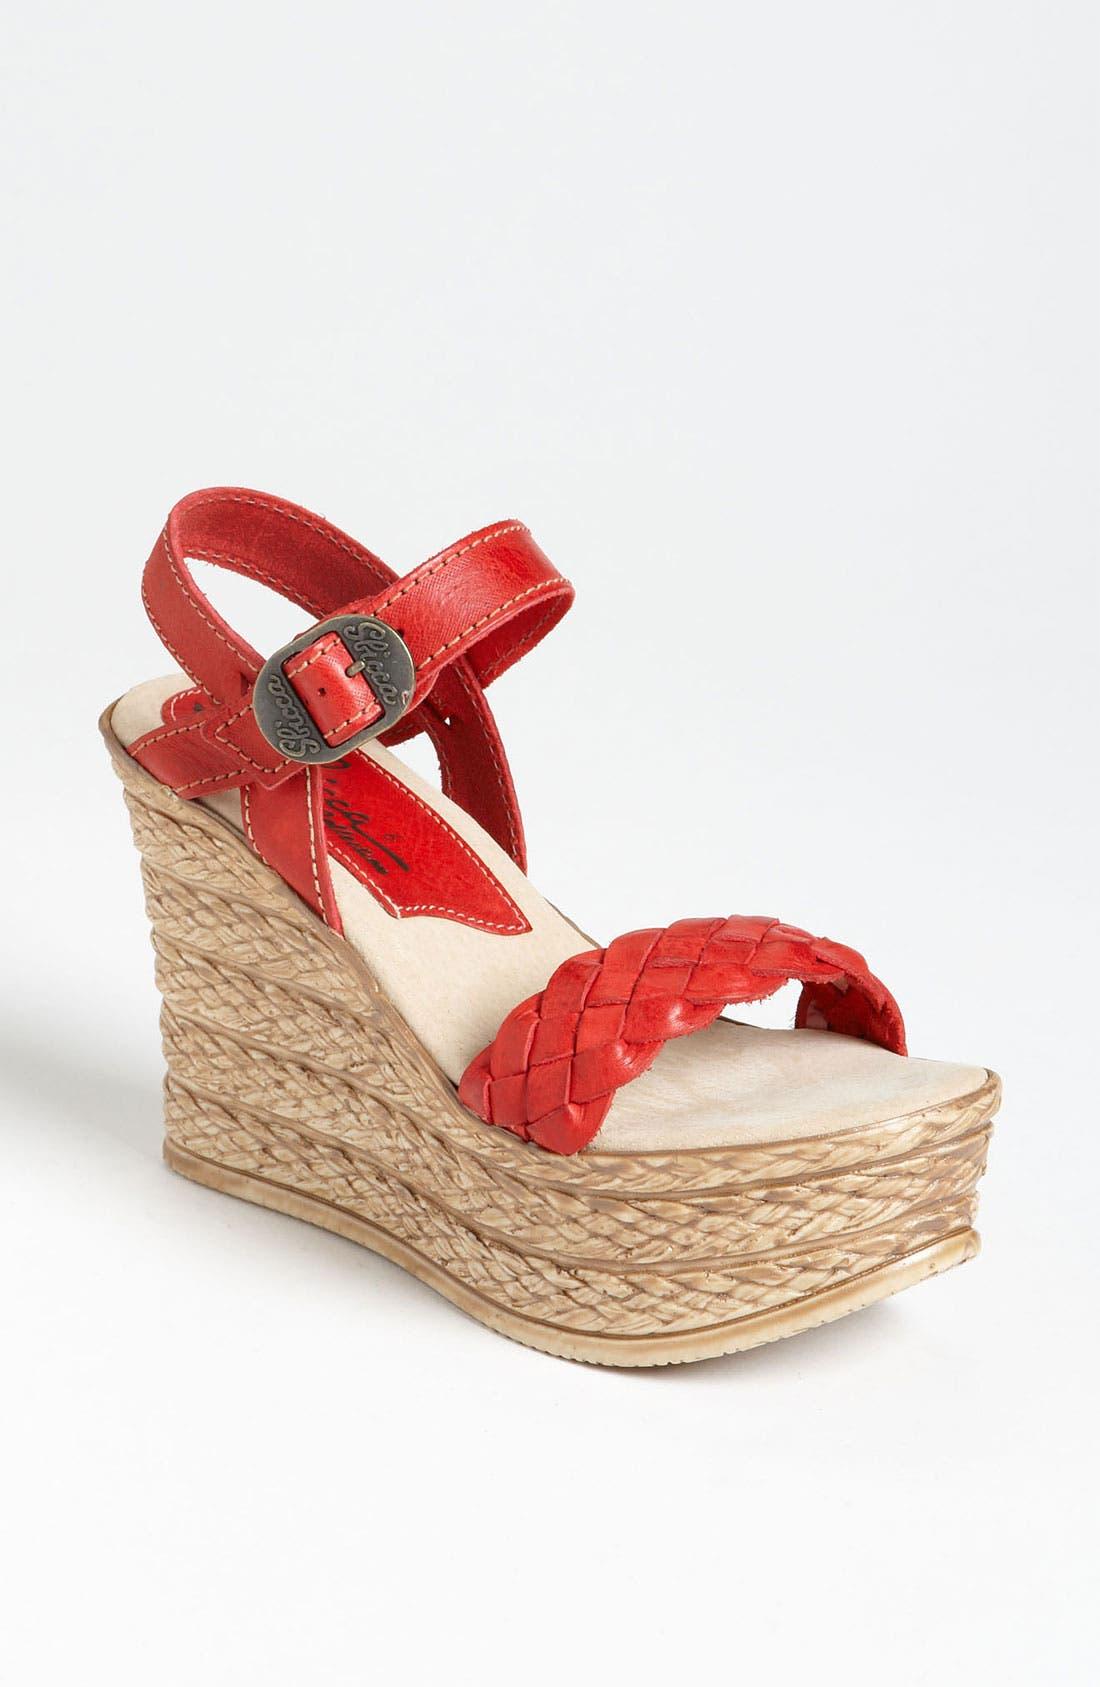 Alternate Image 1 Selected - Sbicca 'Salinas' Sandal